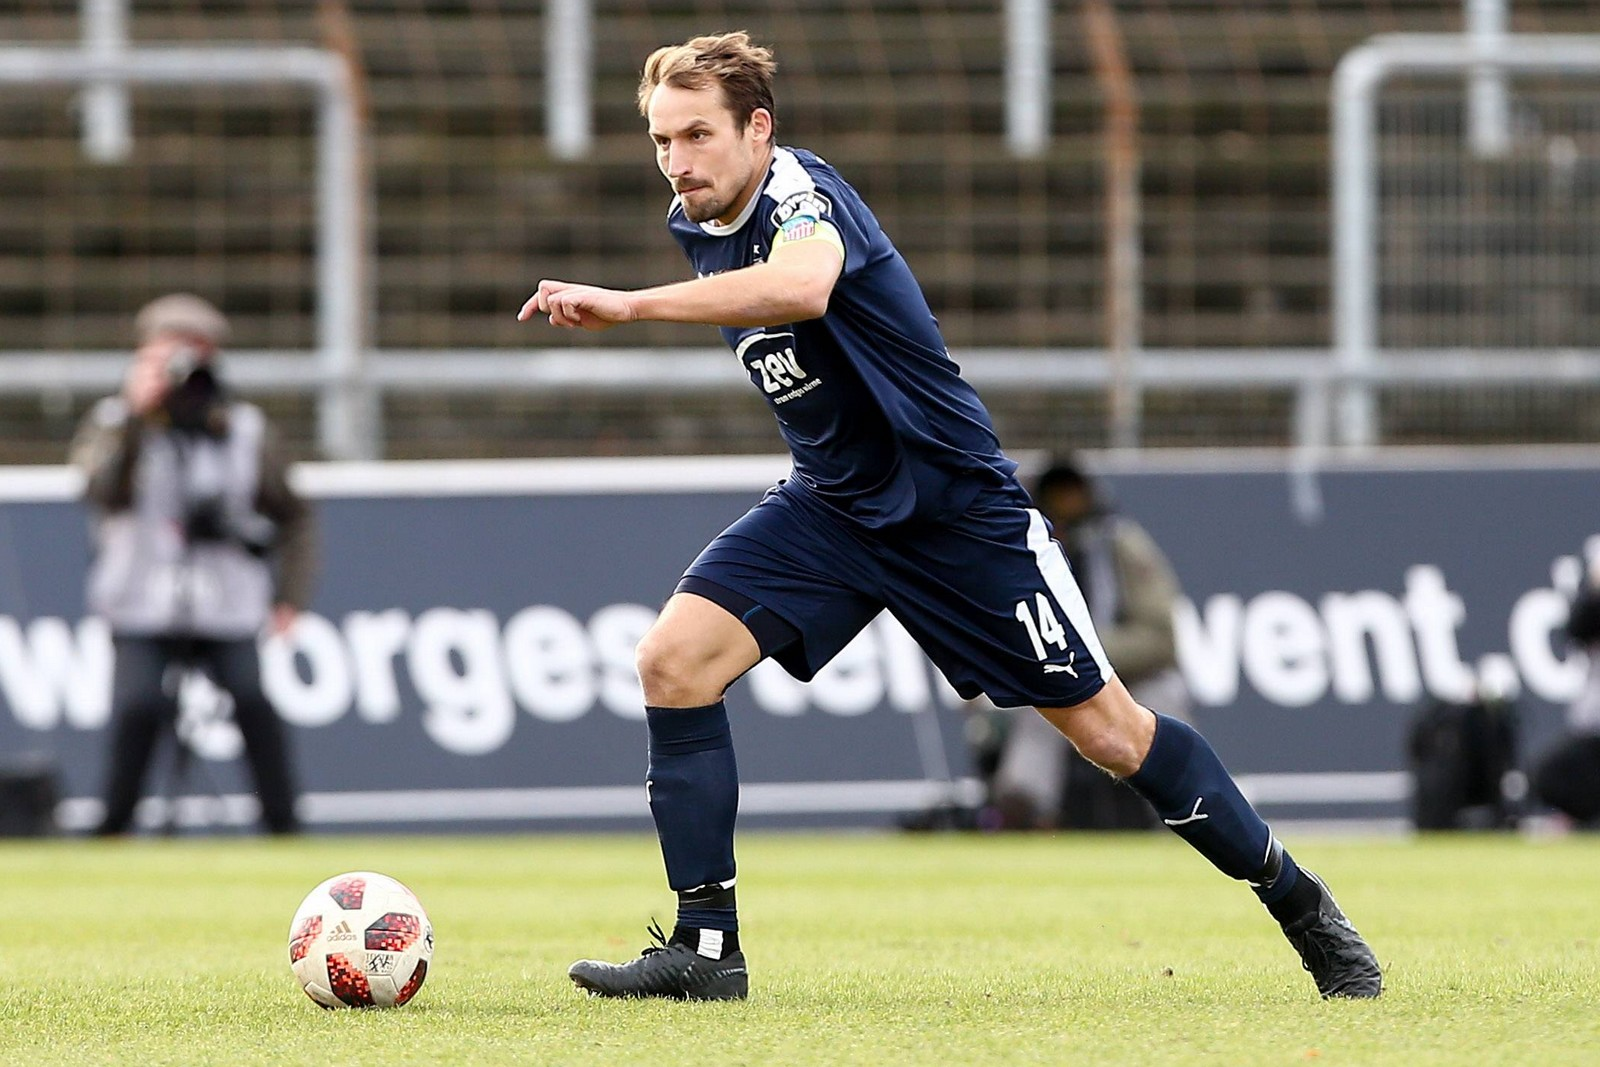 Toni Wachsmuth im Spiel gegen Fortuna Köln.